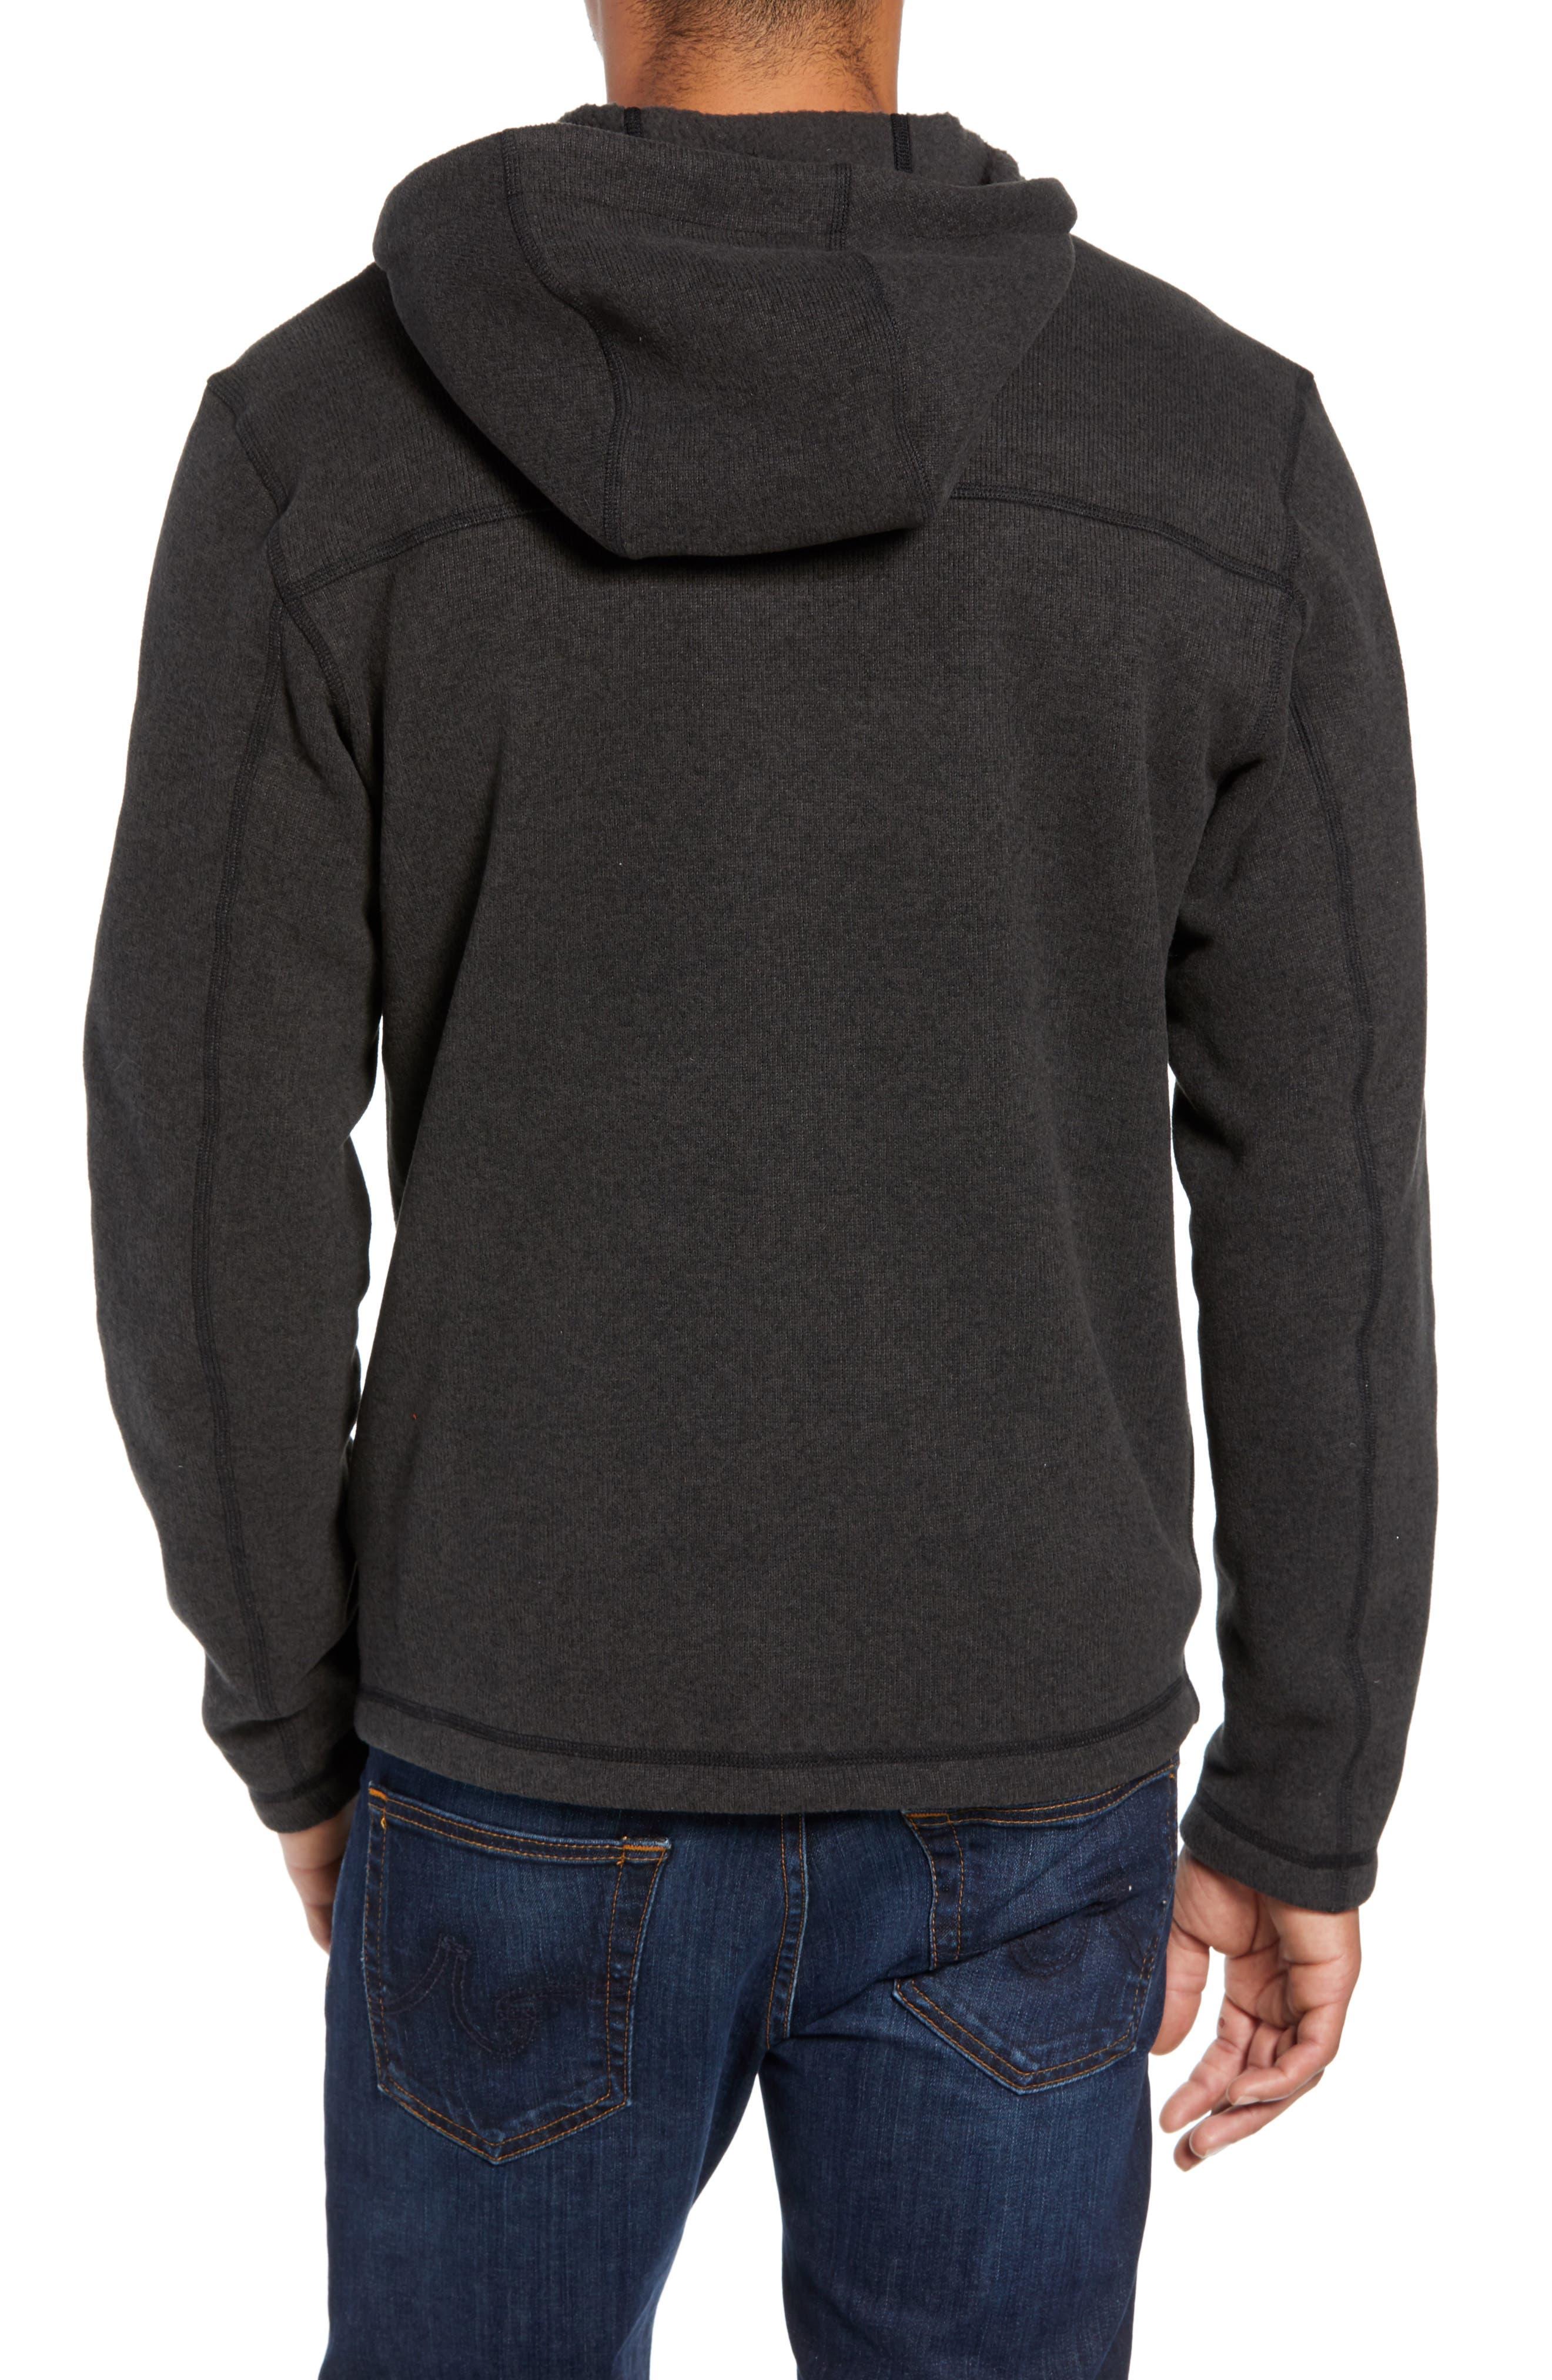 Gordon Lyons Relaxed Fit Sweater Fleece Hoodie,                             Alternate thumbnail 2, color,                             TNF BLACK HEATHER